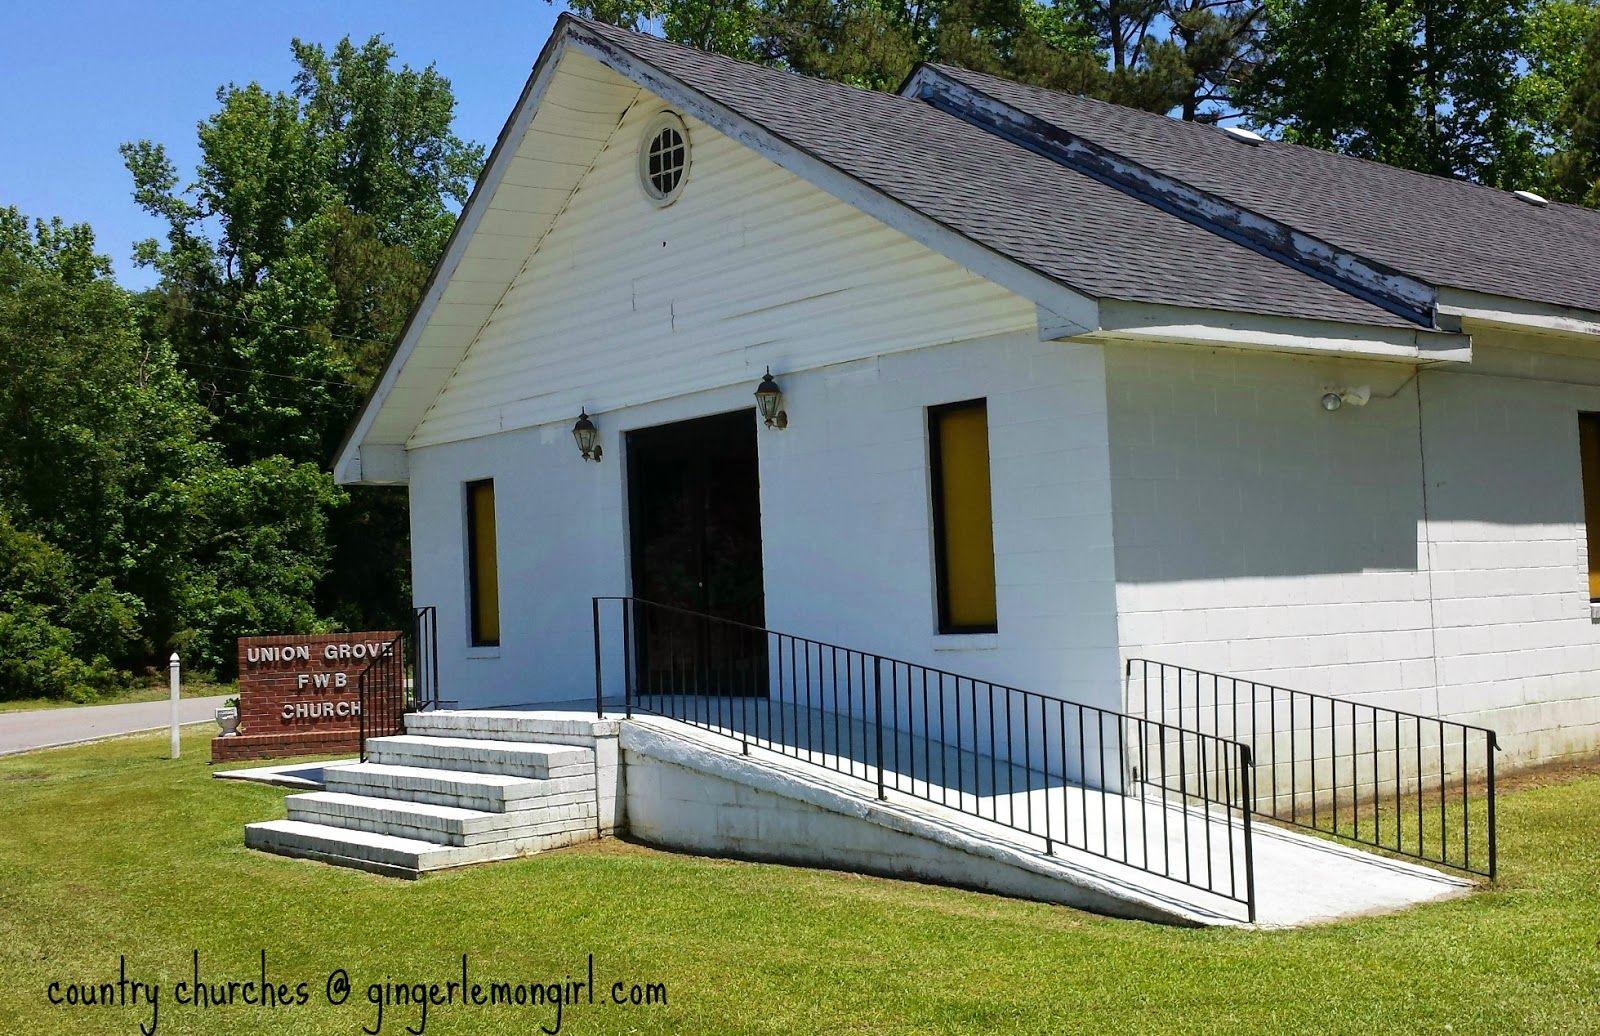 Ginger Lemon Girl: Country Church Photography: Union Grove Freewill Baptist Church